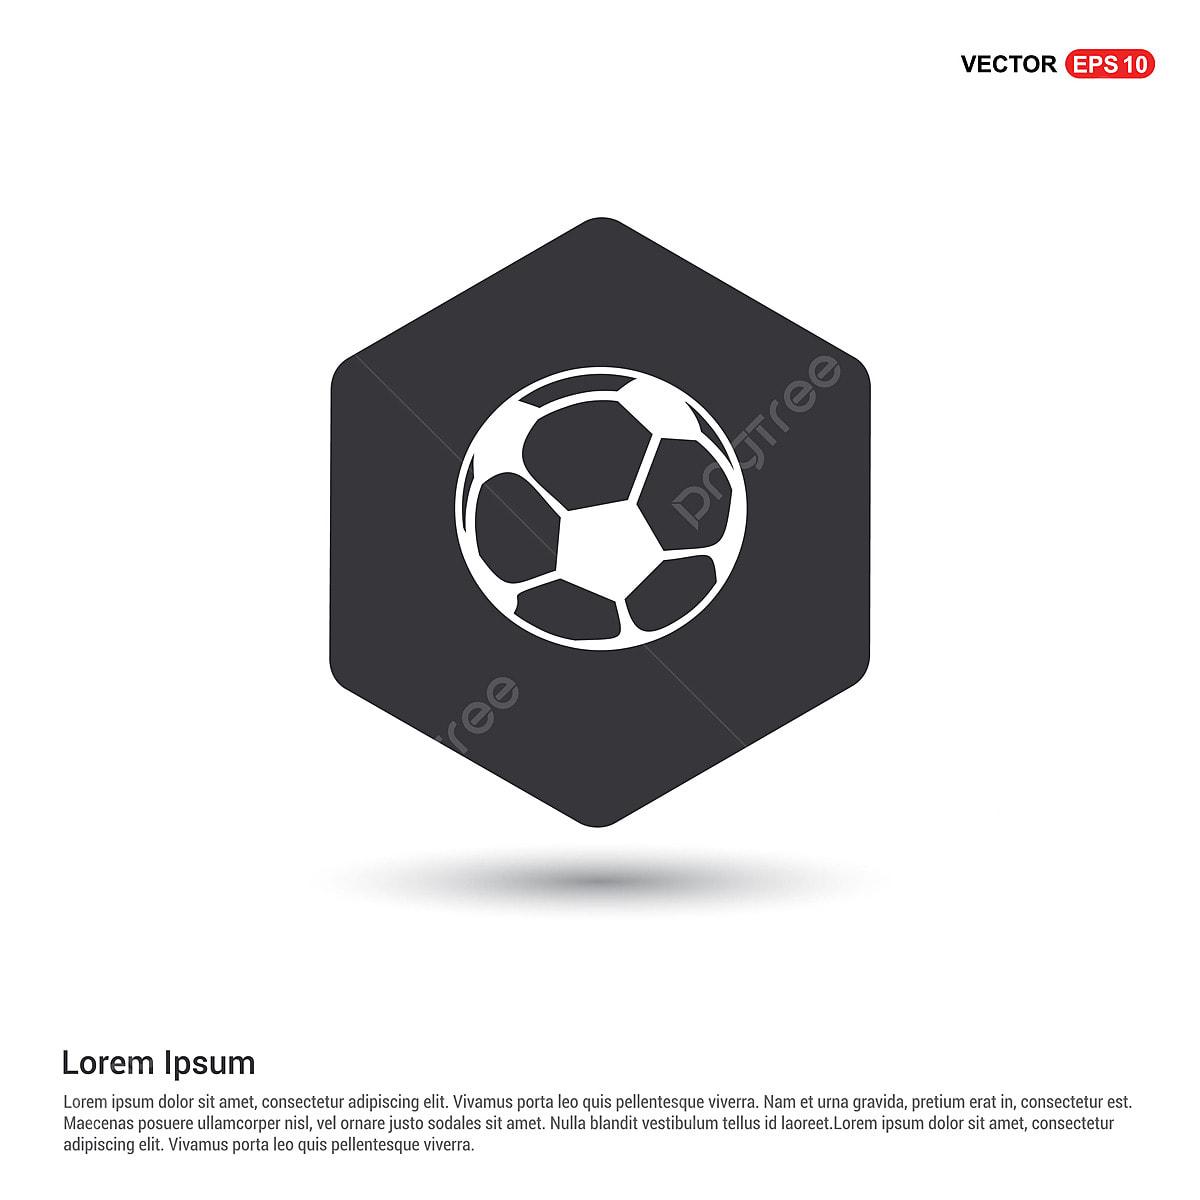 Fussball Ikone Ball Symbol Fussball Png Und Vektor Zum